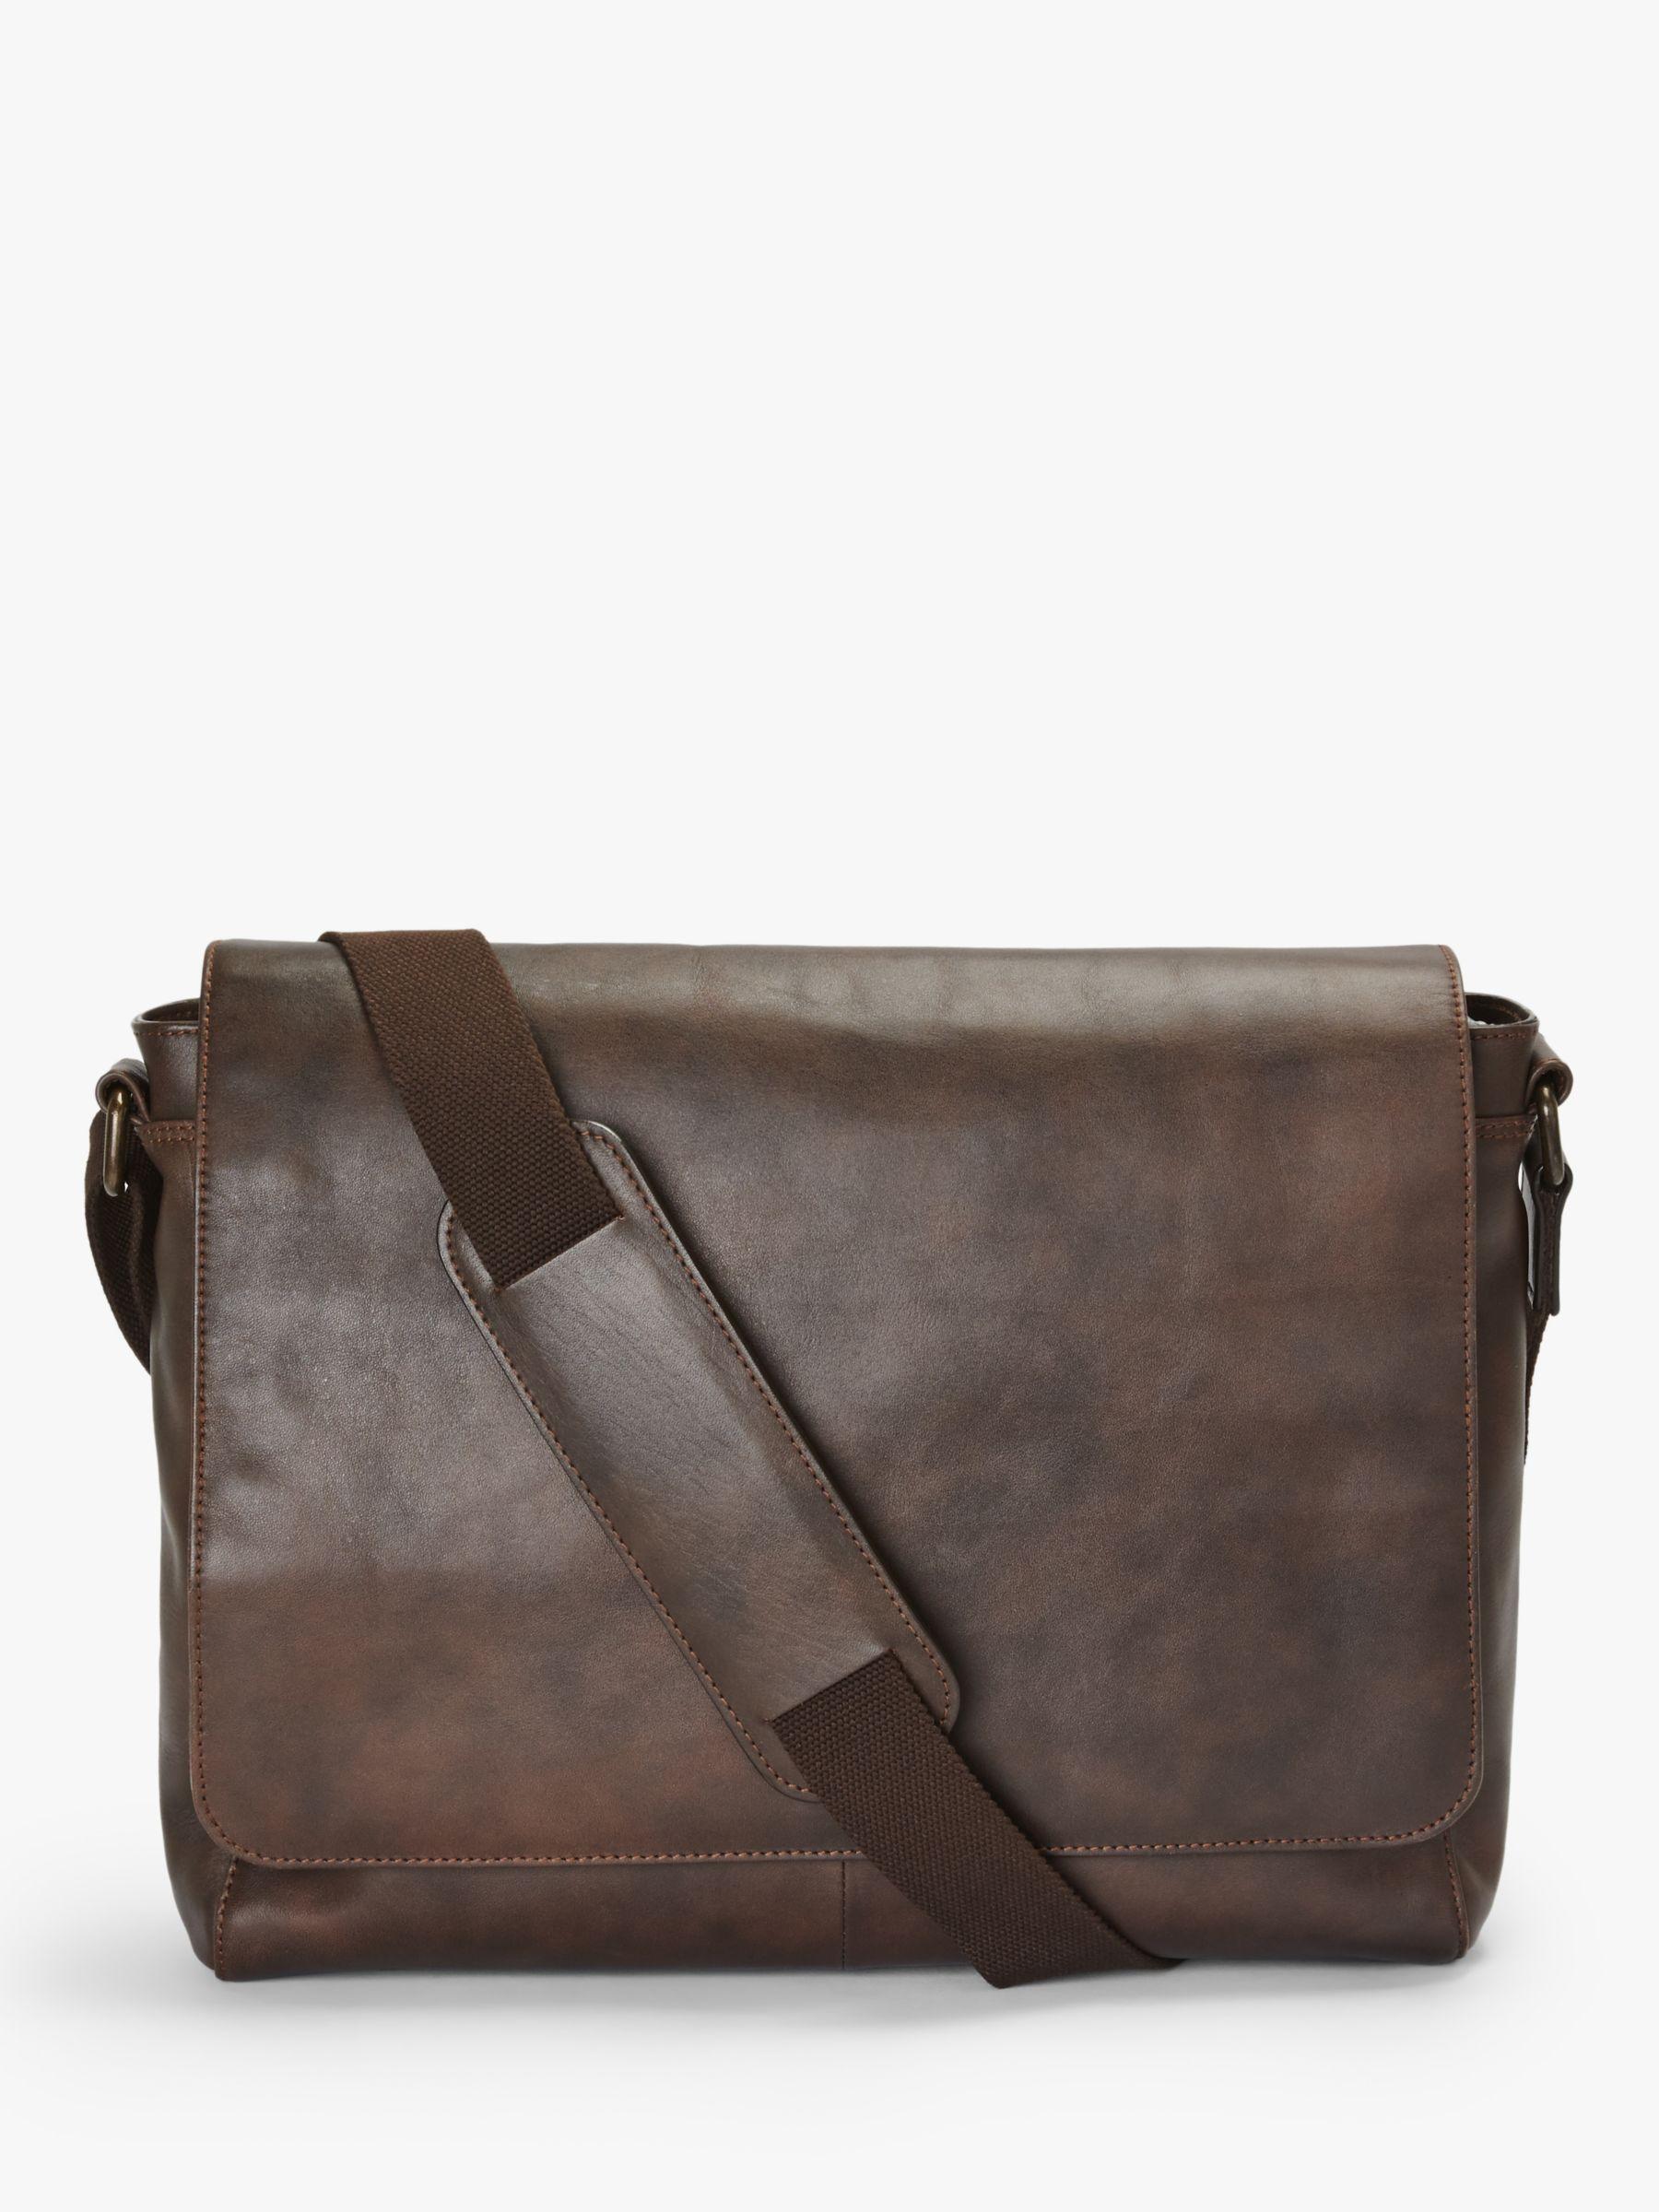 c31ea93ef3e John Lewis & Partners Edinburgh Leather Messenger Bag, Brown